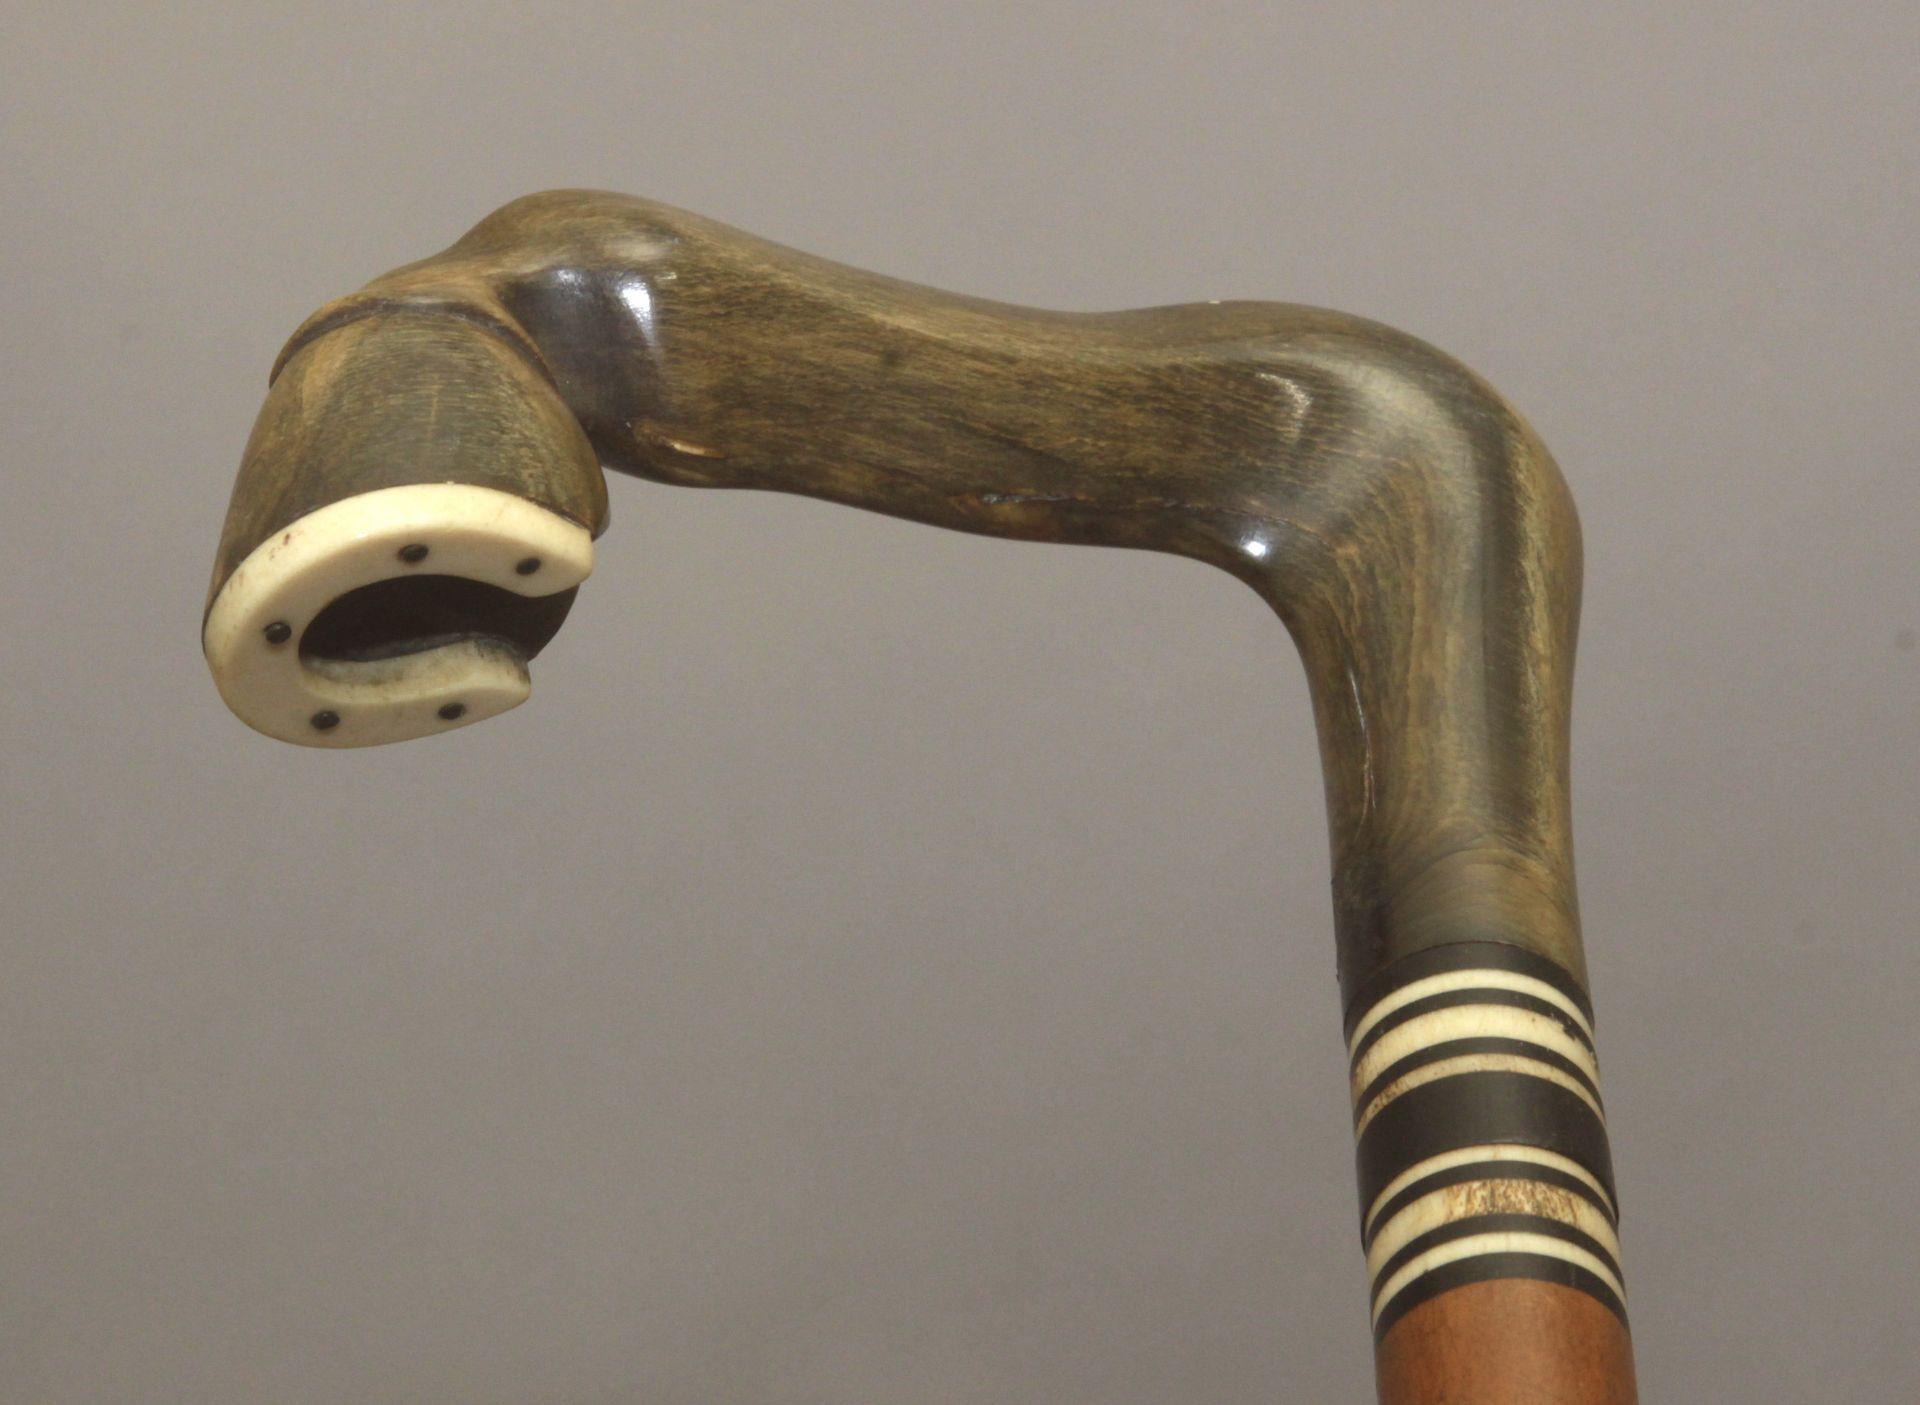 A 20th century wood, horn and bone sample walking cane - Bild 5 aus 7